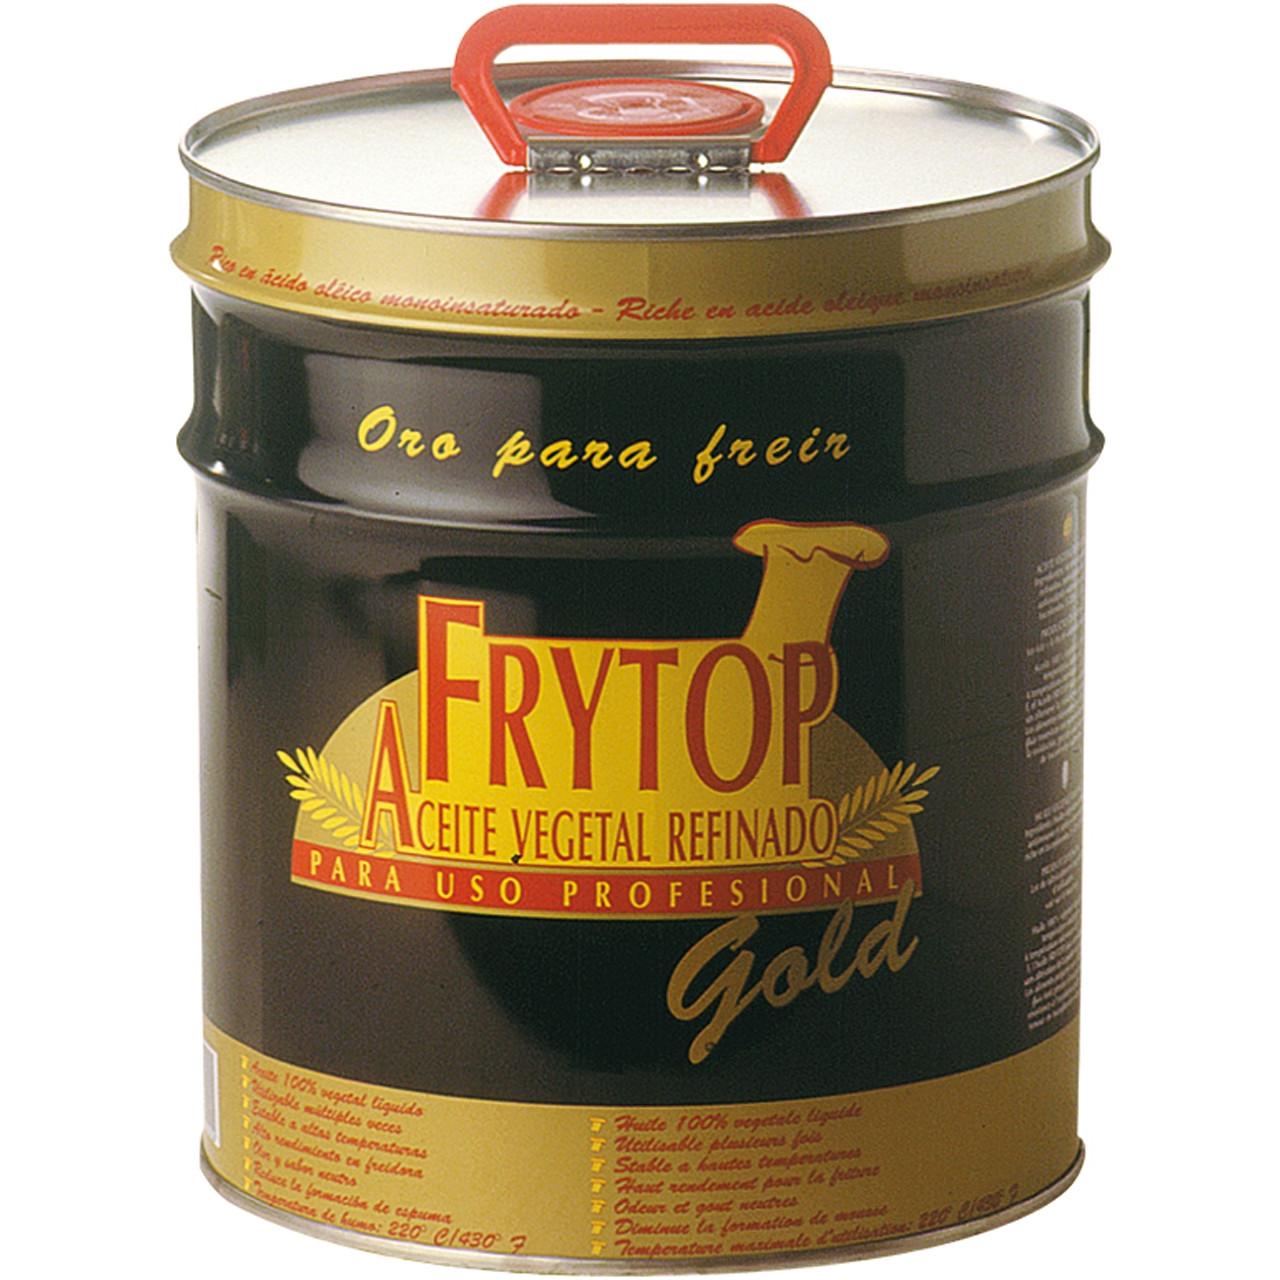 Frytop gold oli fregir